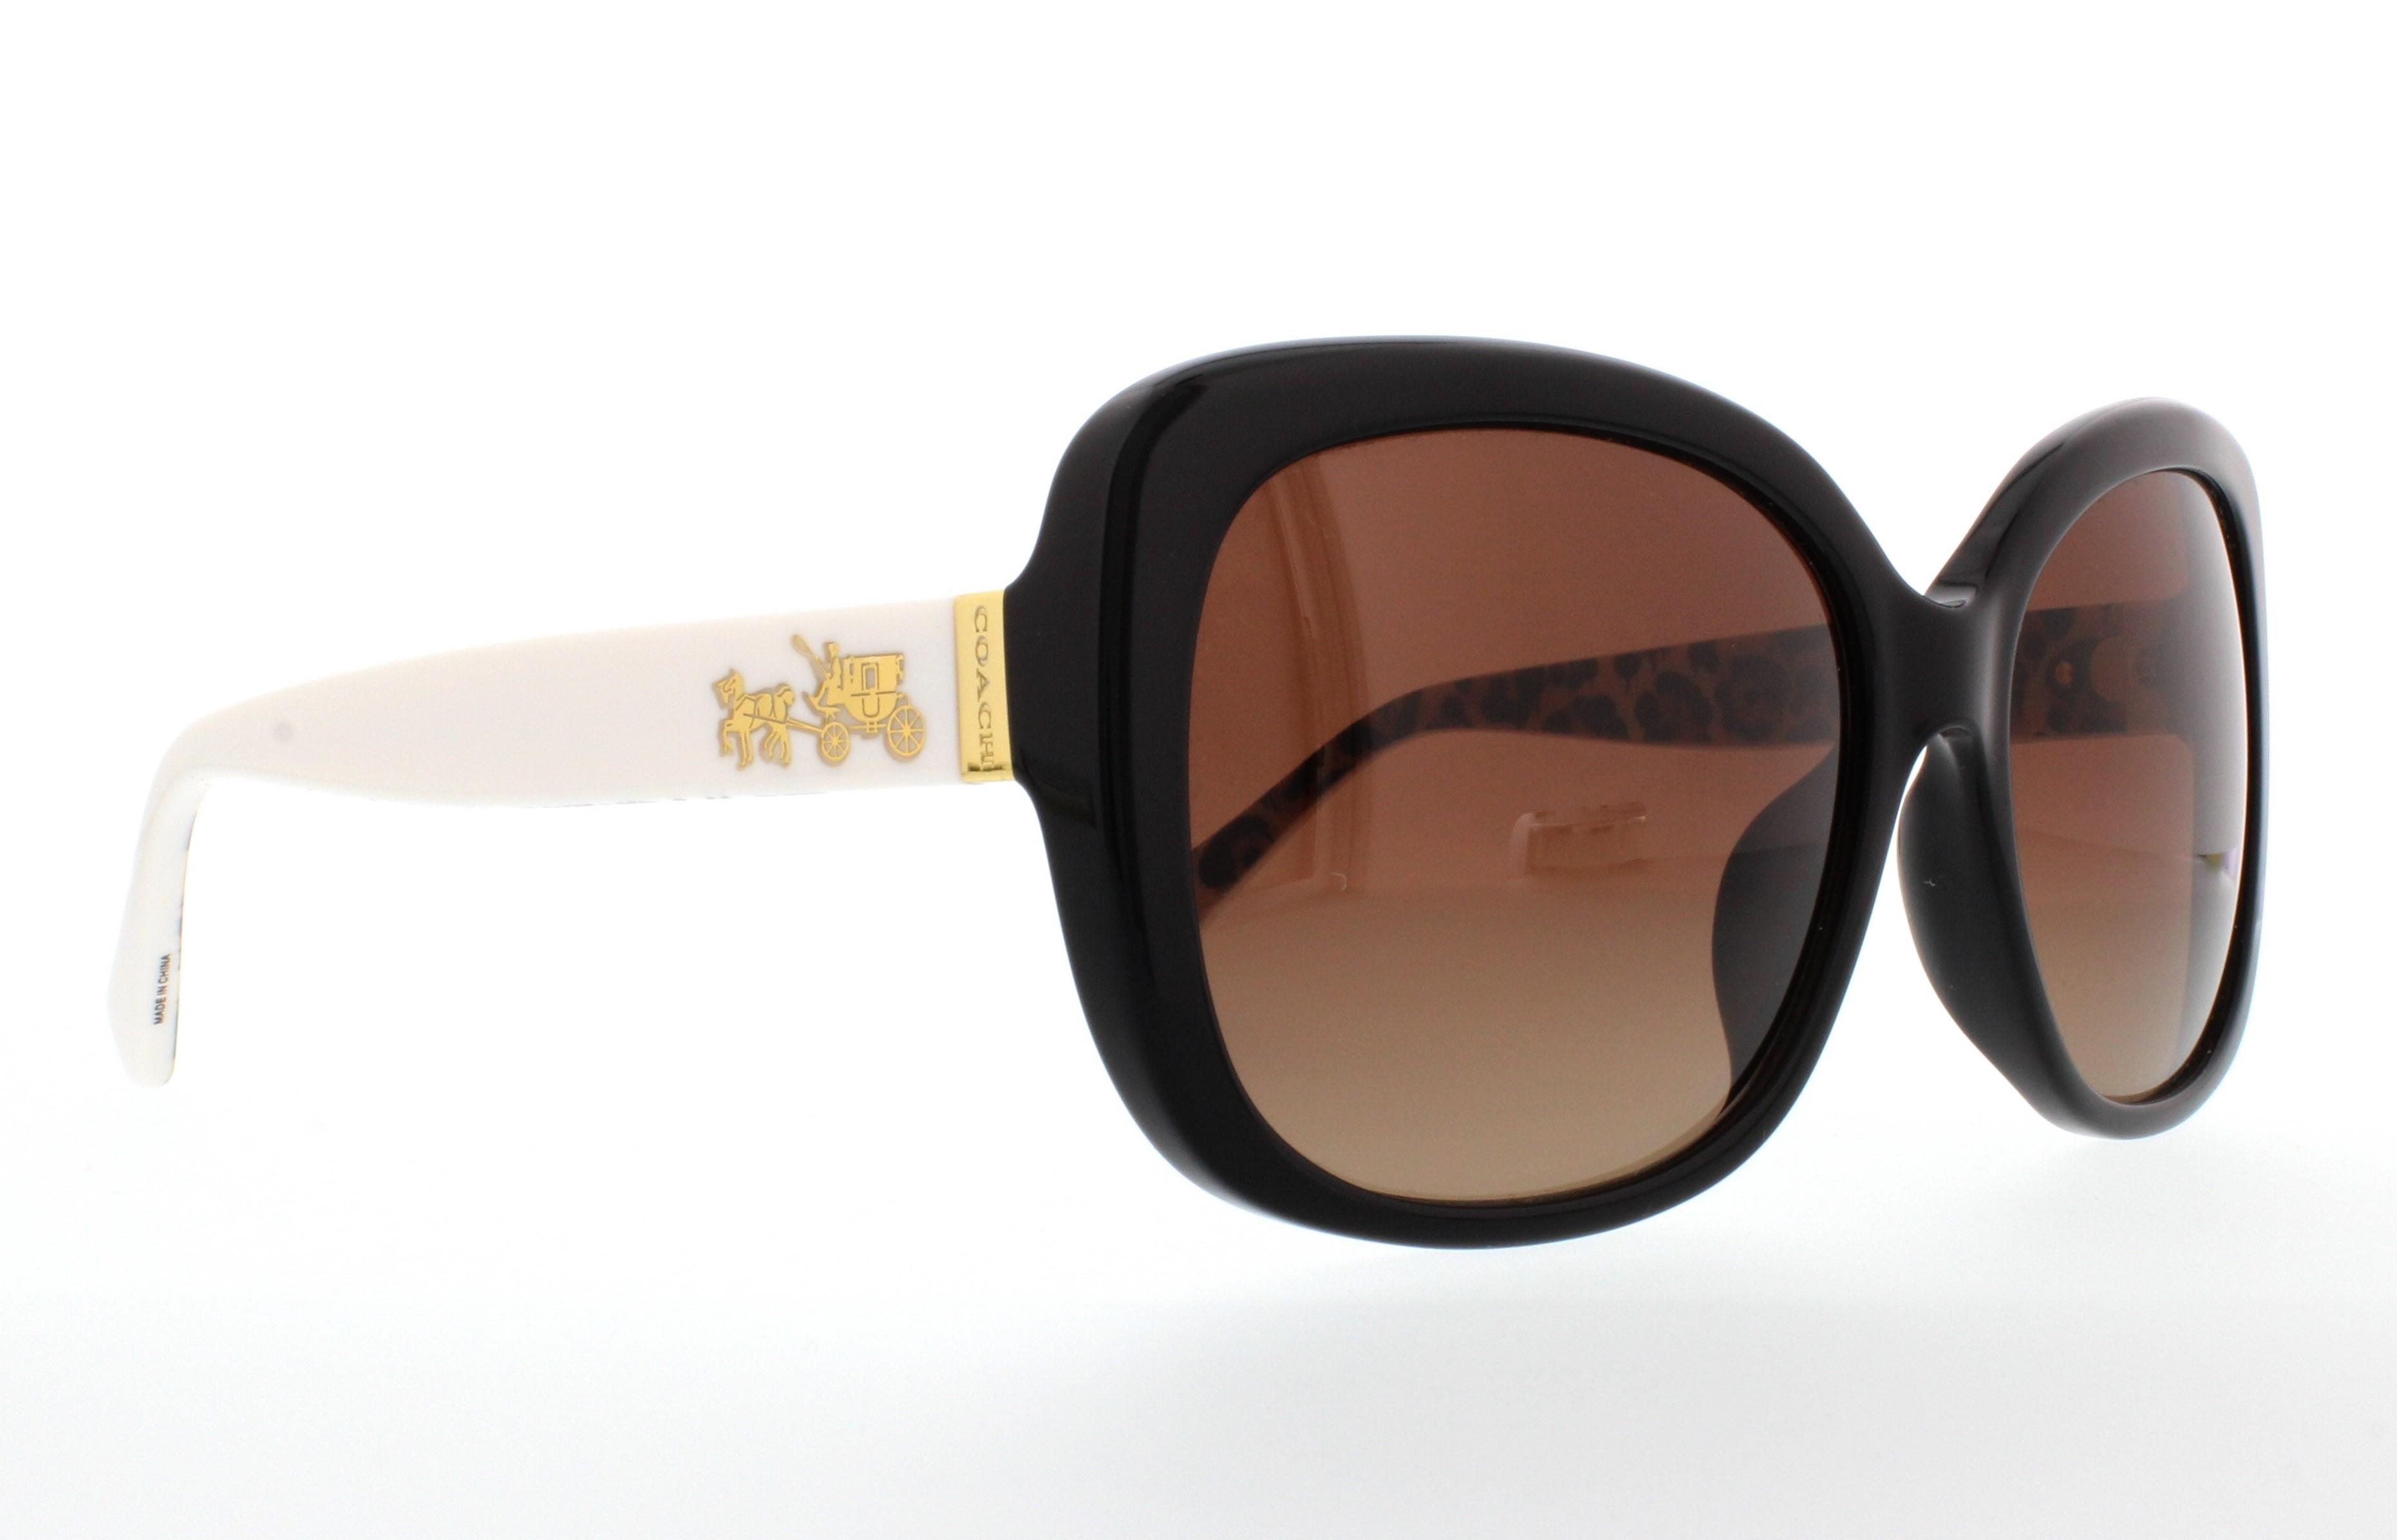 8813430a1098 ... low price coach sunglasses hc8158f l559 5336t5 black ivory wild beast  58mm 54244 59e5c